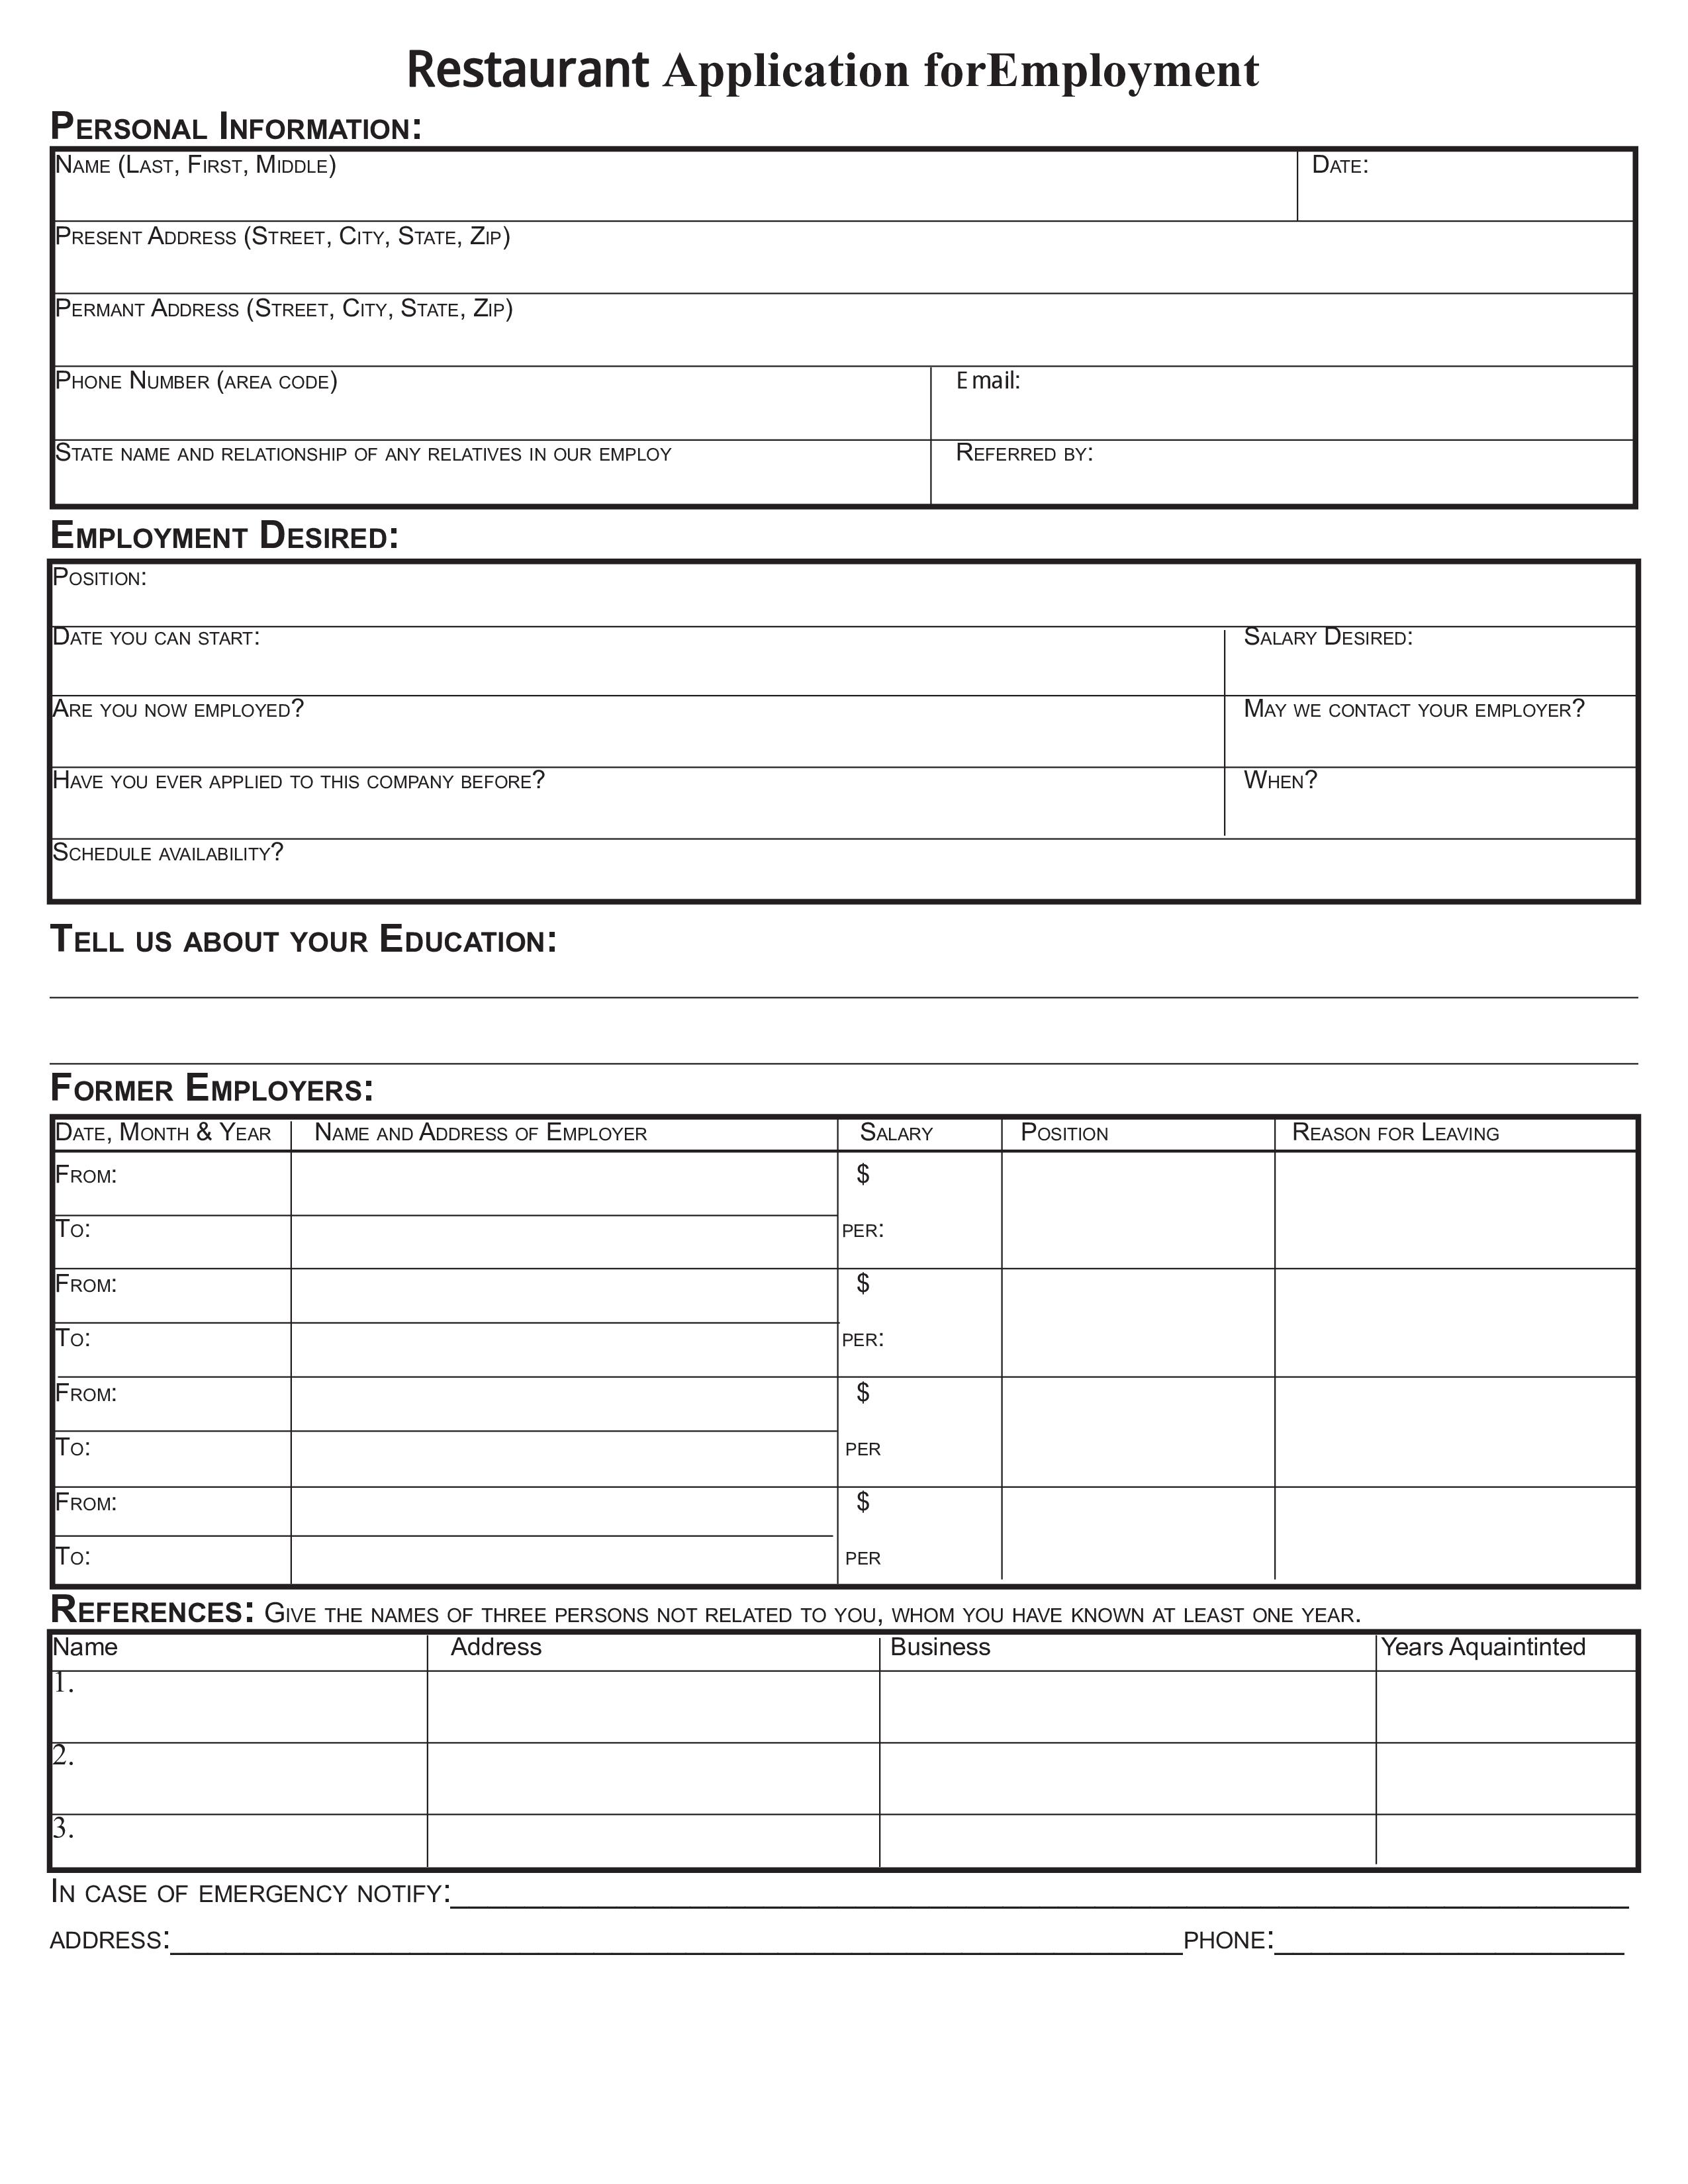 Restaurant Job Application Form - How to create a Restaurant Job ...